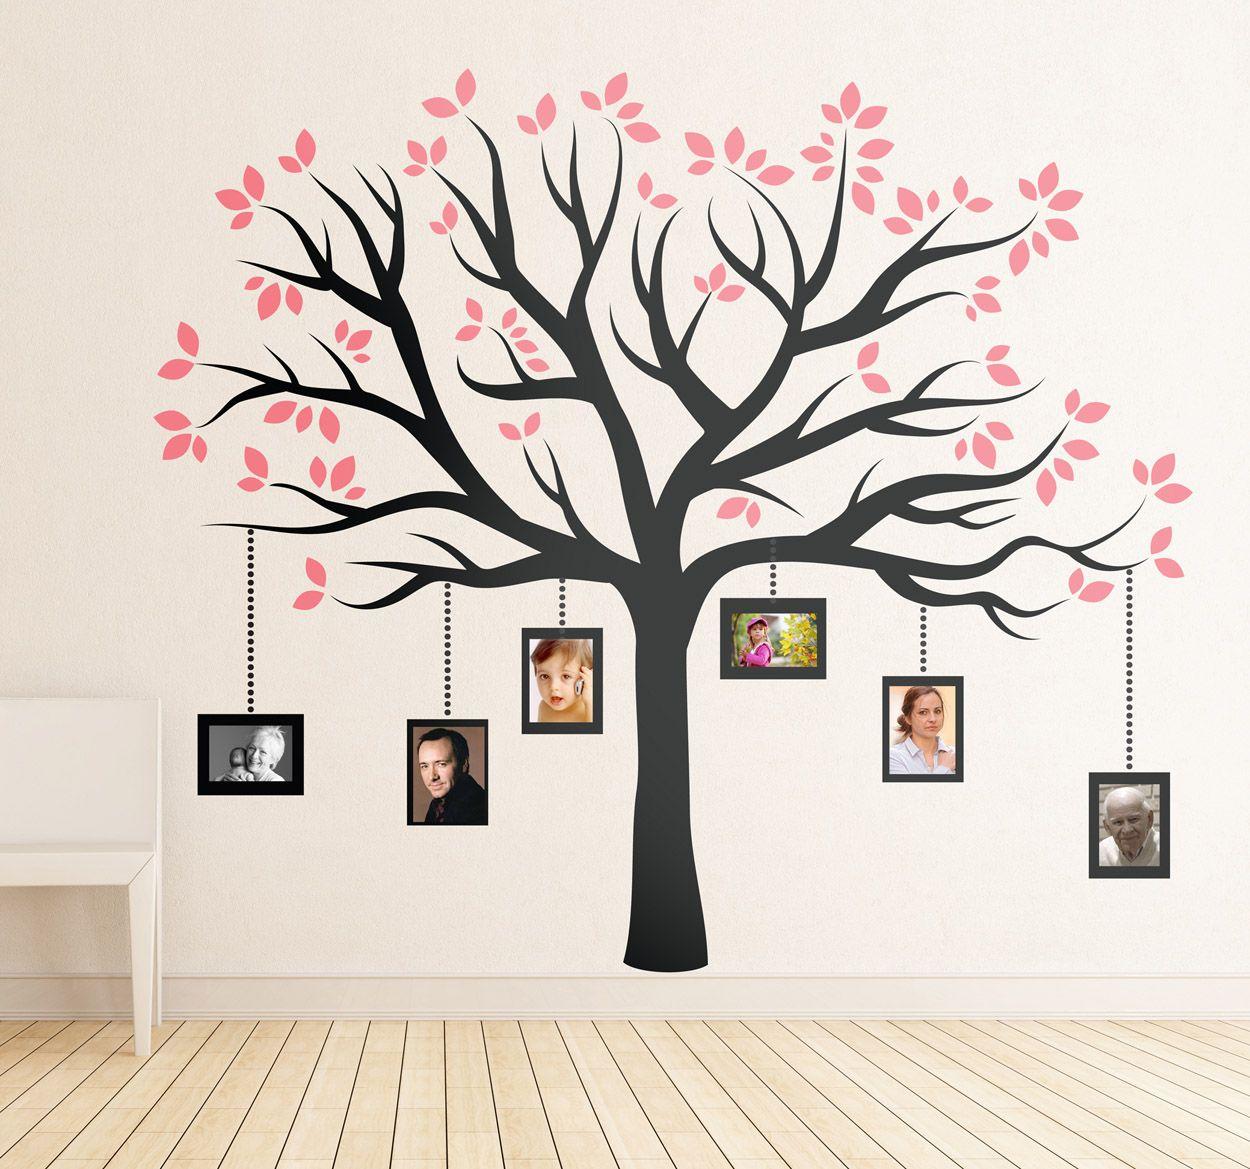 Vinilo decorativo marcos árbol familiar | casa | Pinterest | Chf ...